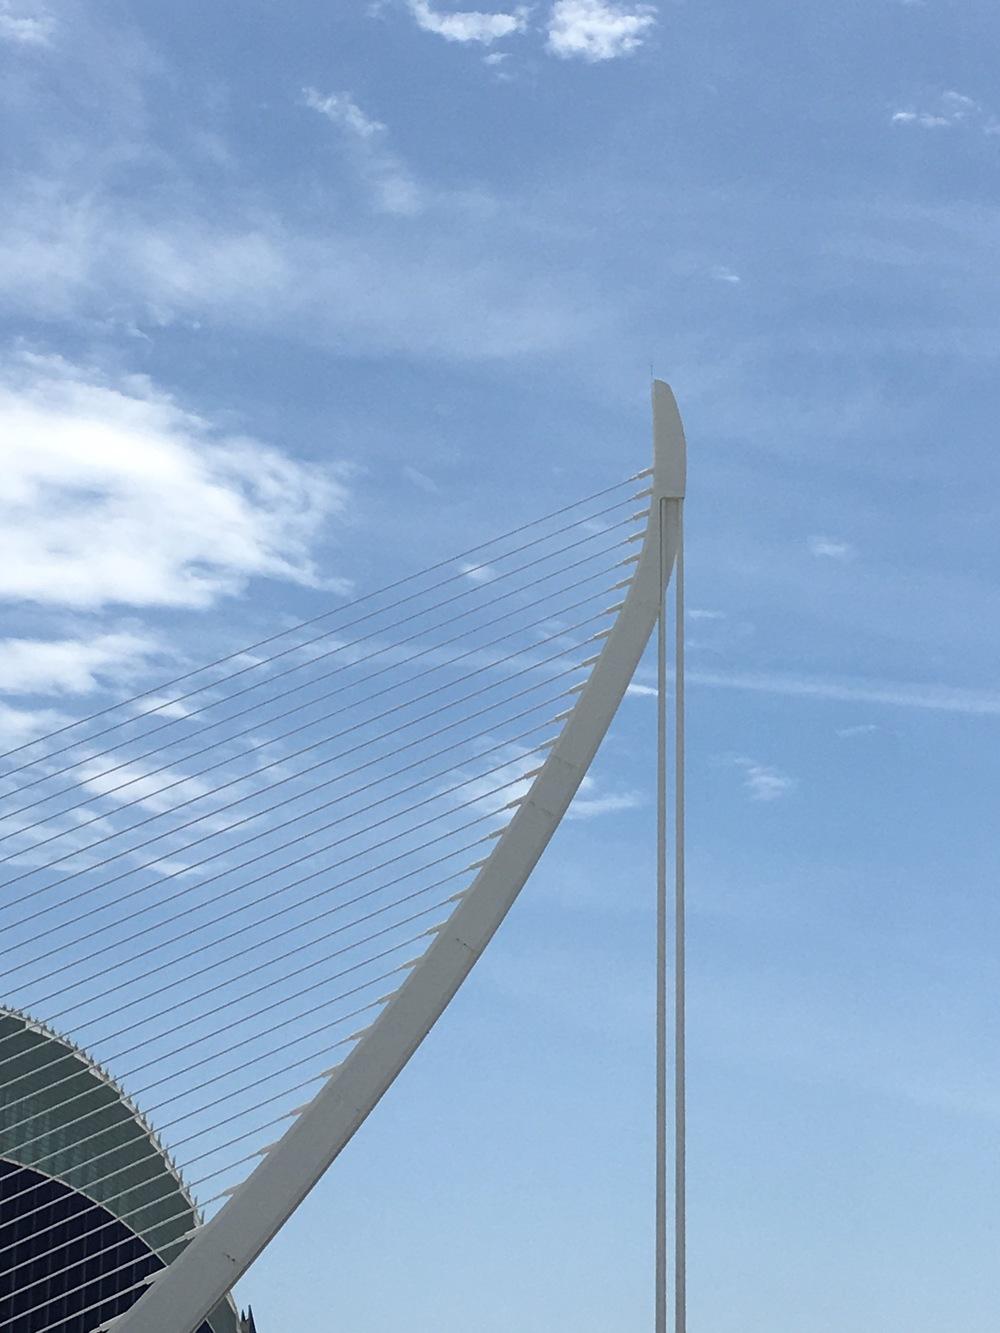 Assut de l'Or Bridge